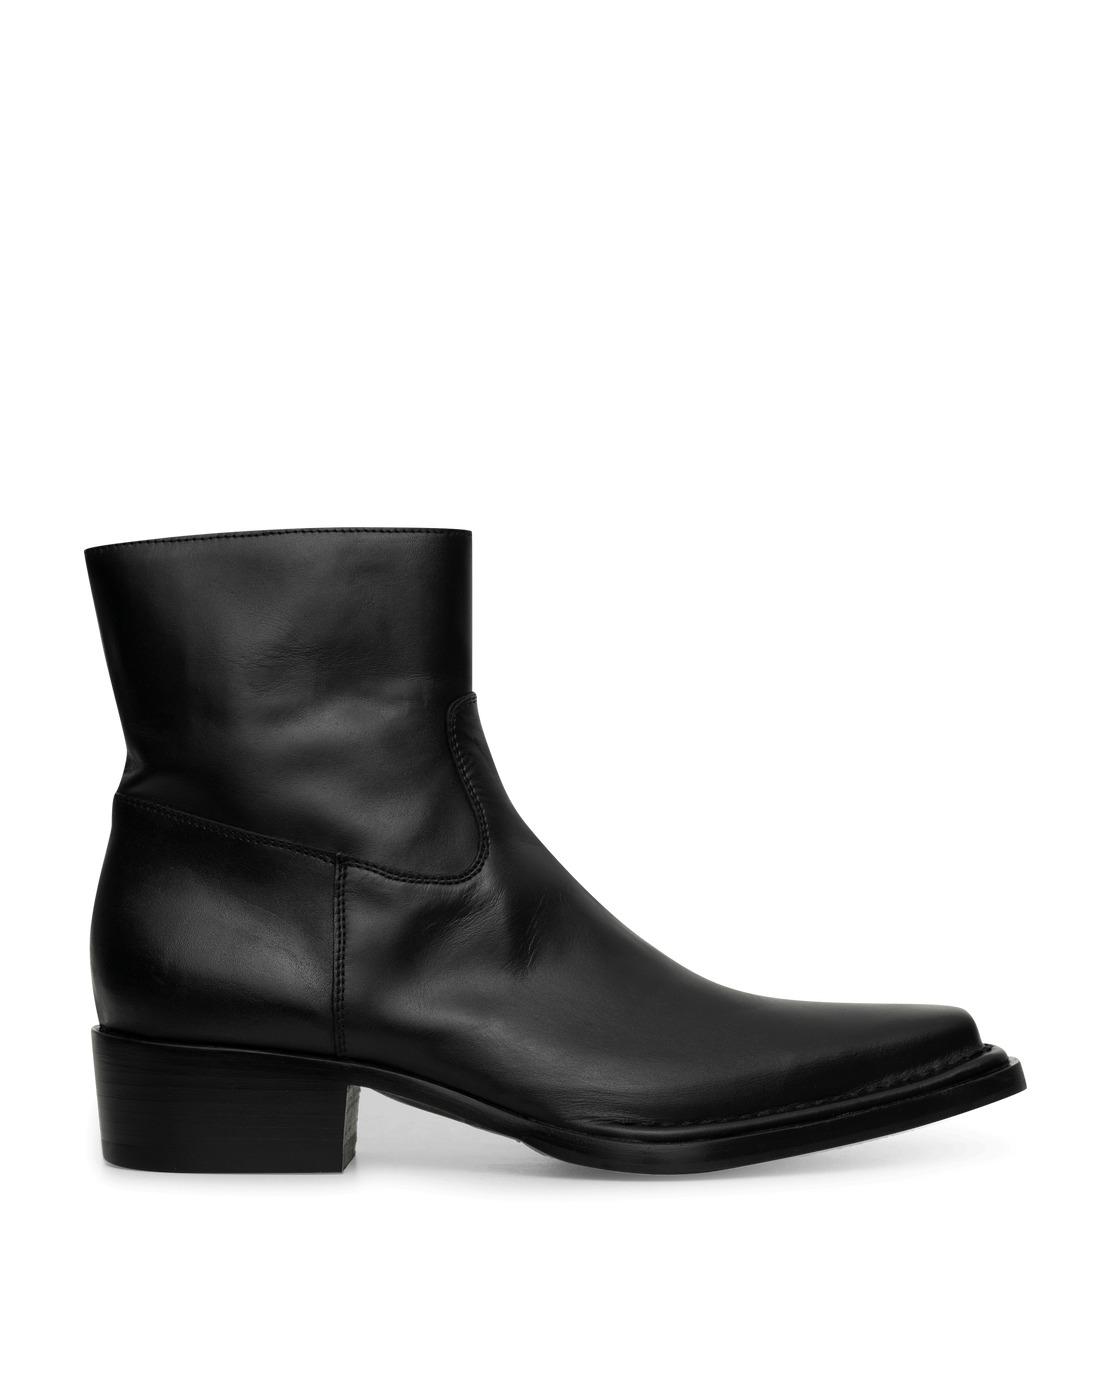 Acne Studios Leather Boots Black